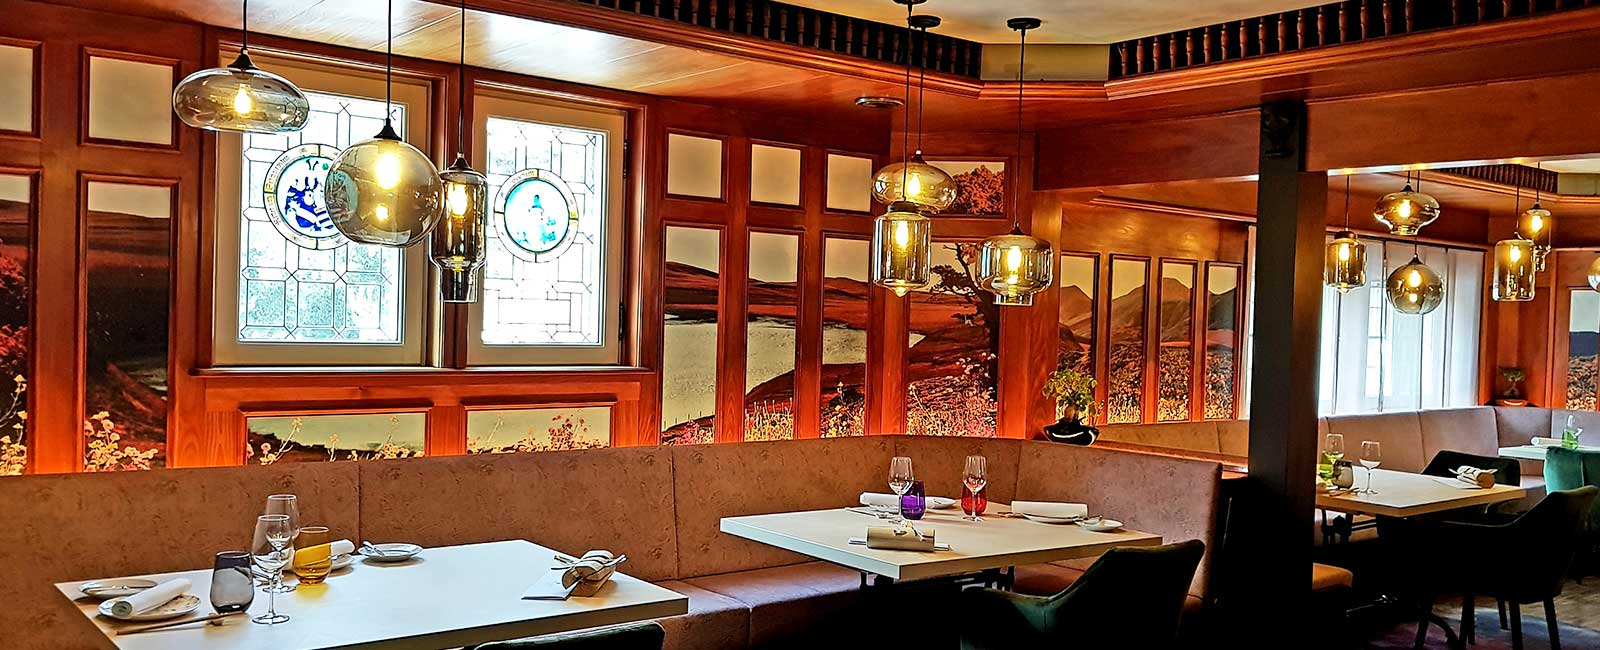 Haus Oveney Café Restaurant